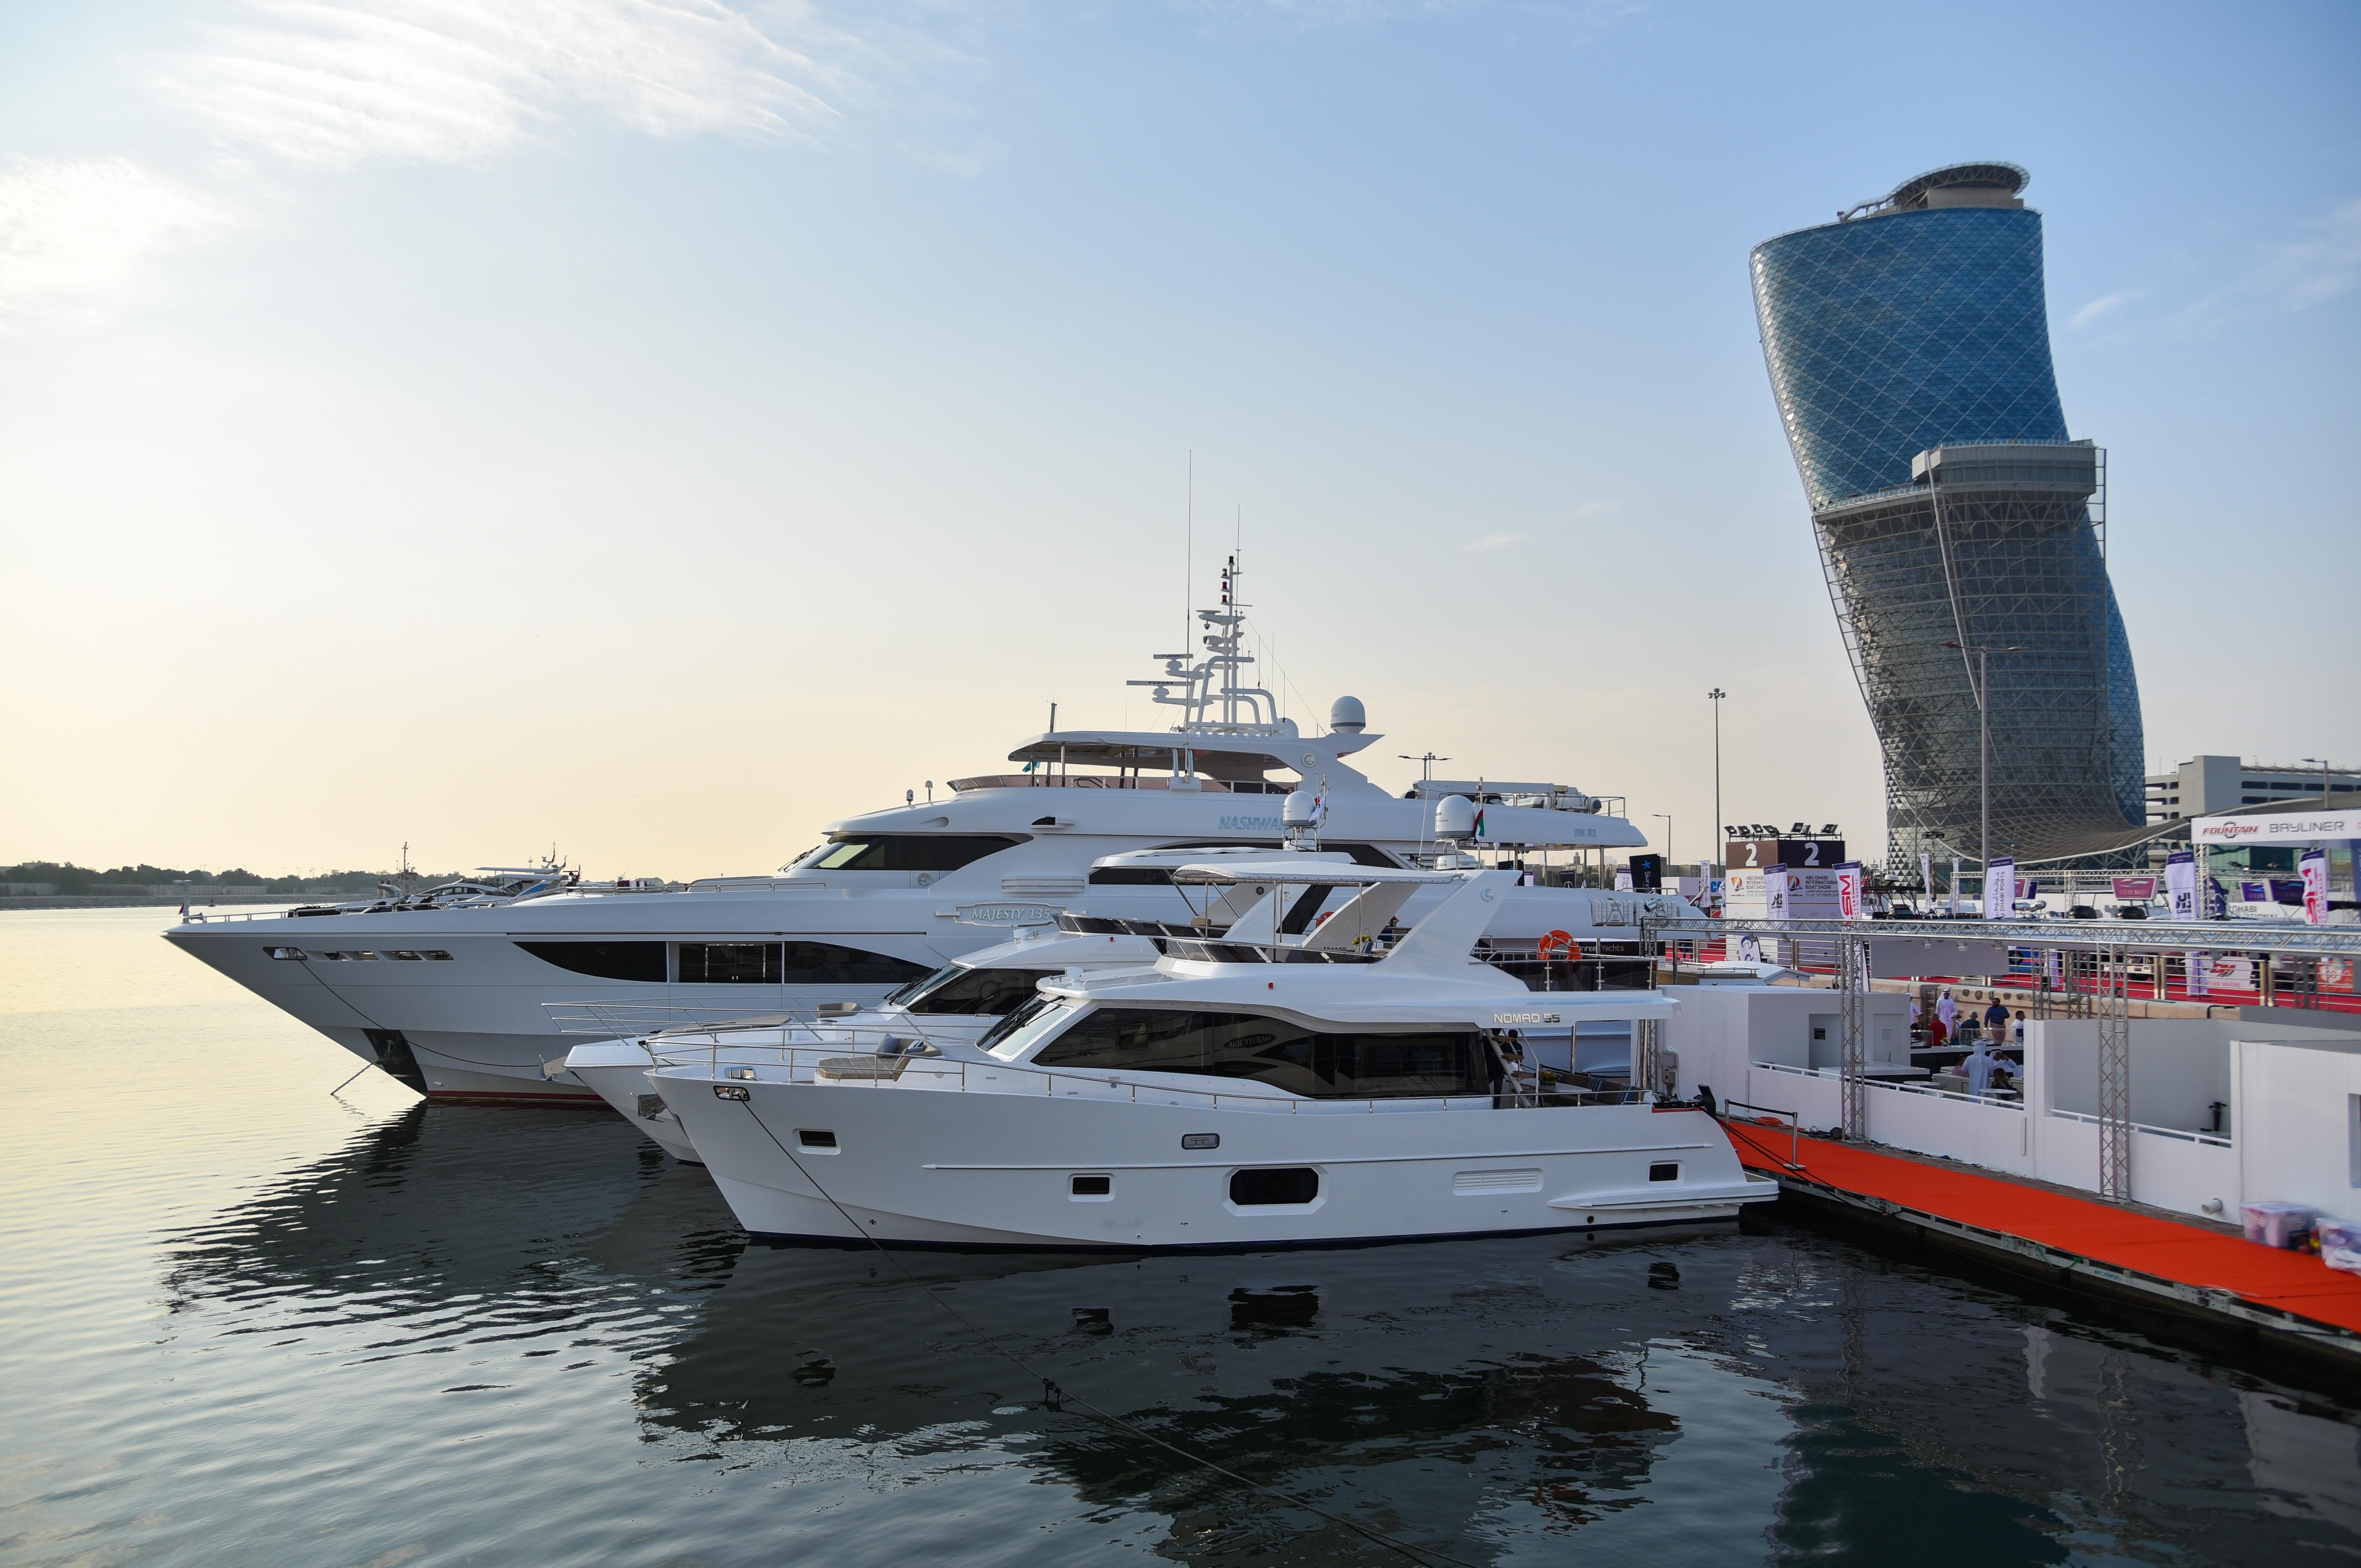 Gulf Craft at Abu Dhabi Boat Show 2018 Day 2 (2).jpg